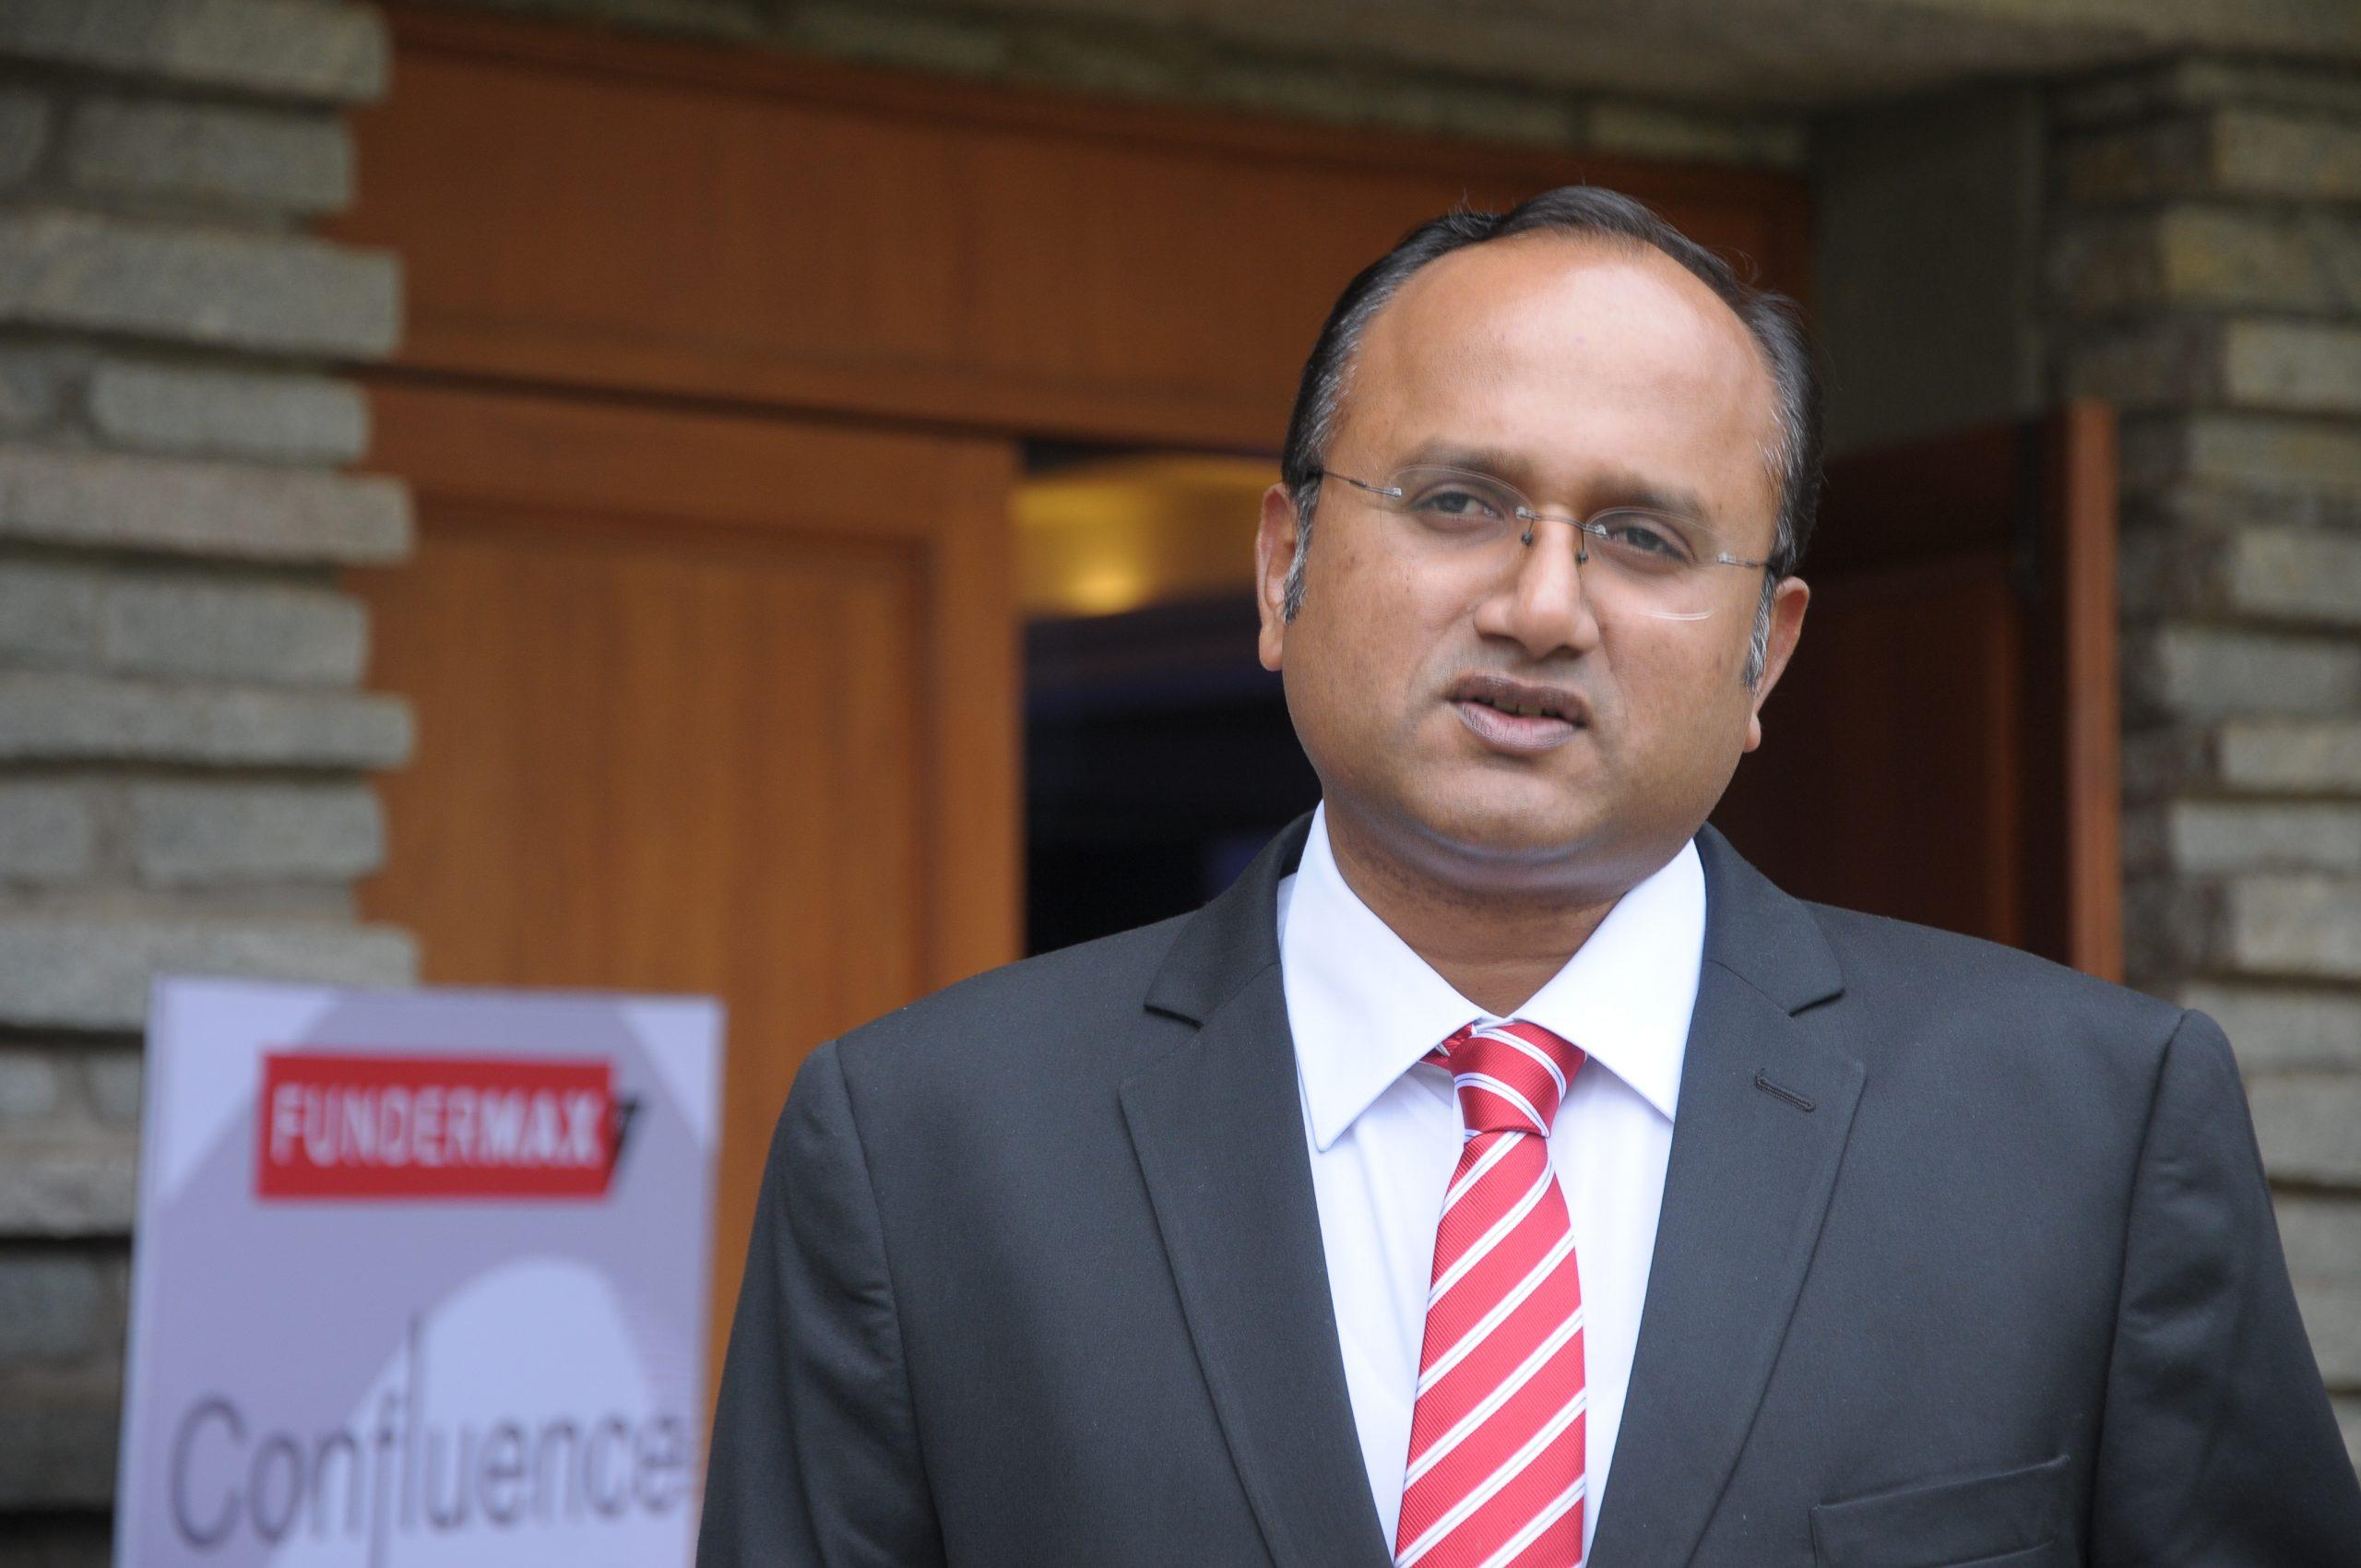 Karnataka State Budget 2021 Reactions: Dr. Prashanth Reddy, Managing Director, Fundermax India...